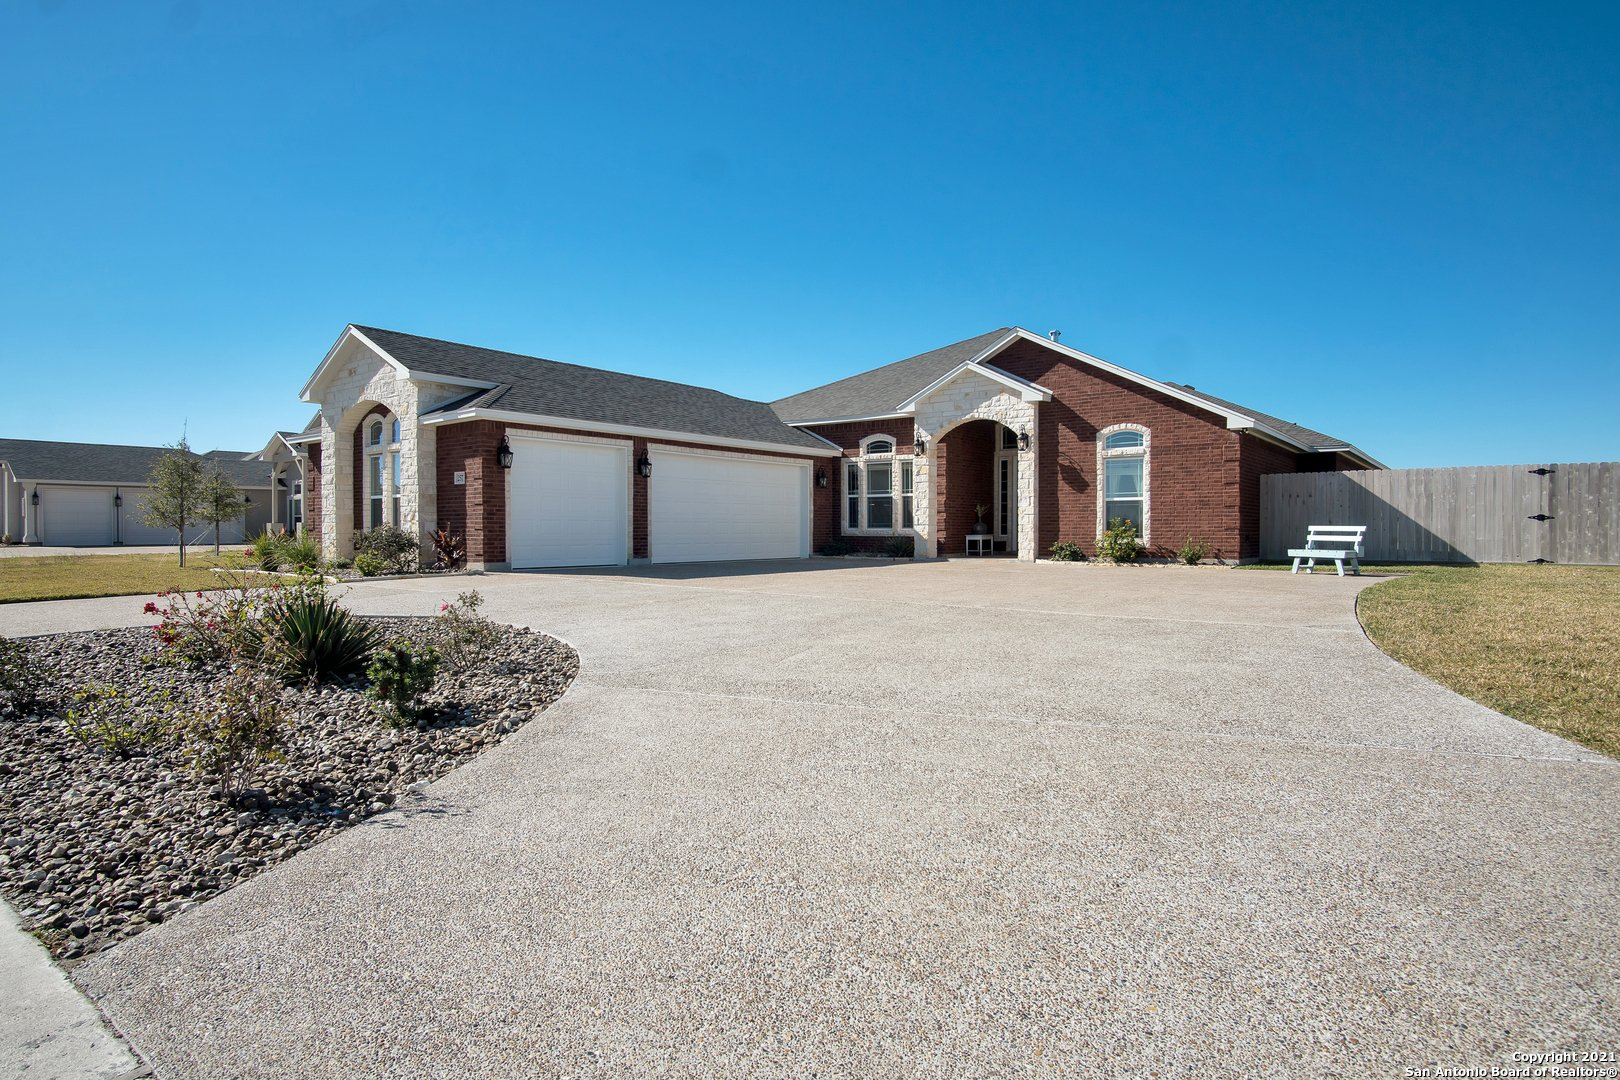 House in Corpus Christi, Texas, United States 1